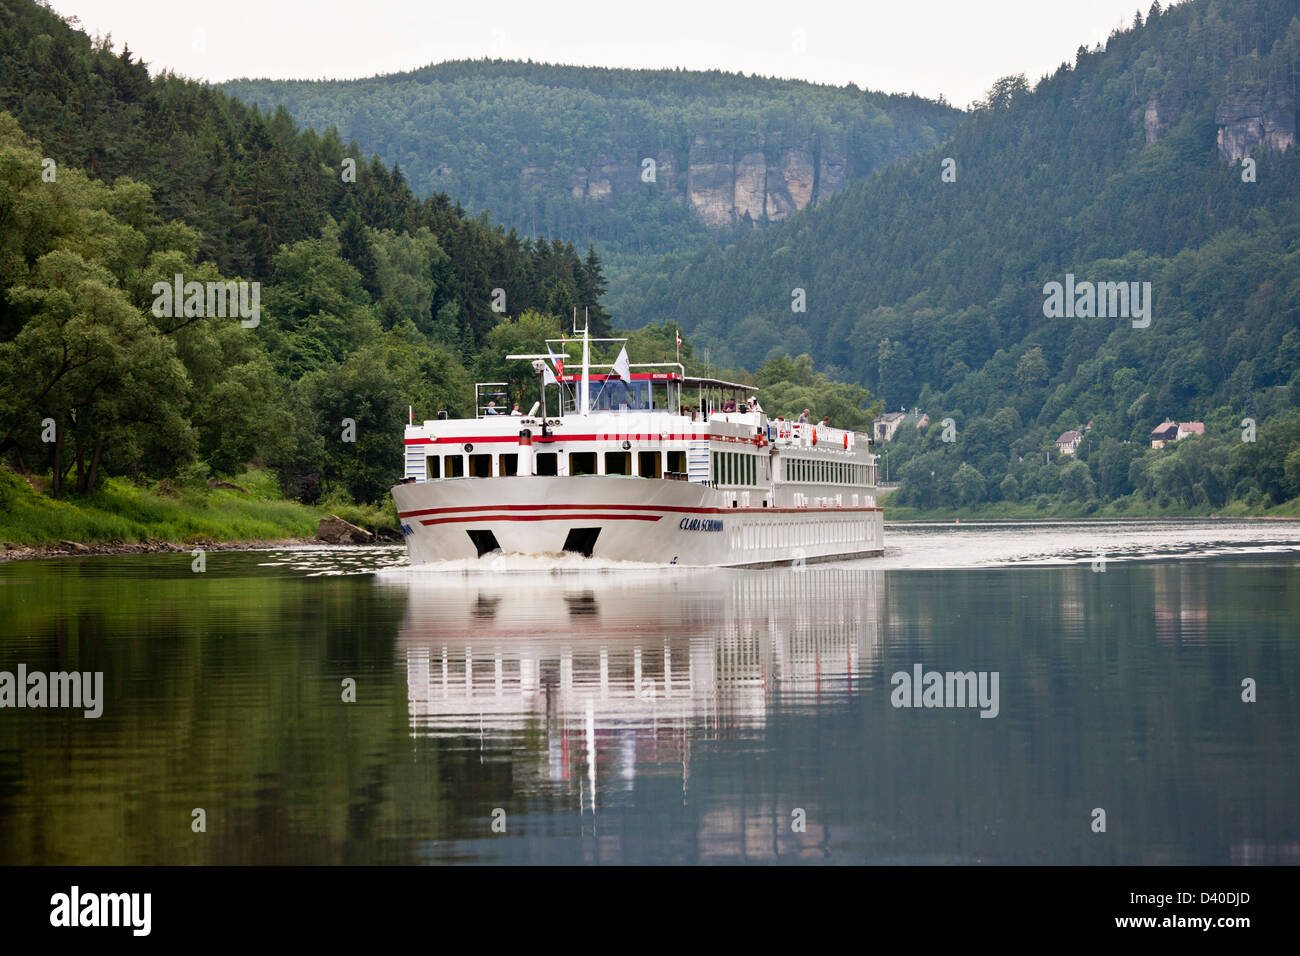 A cruising ship on the Danube in Austria - Stock Image